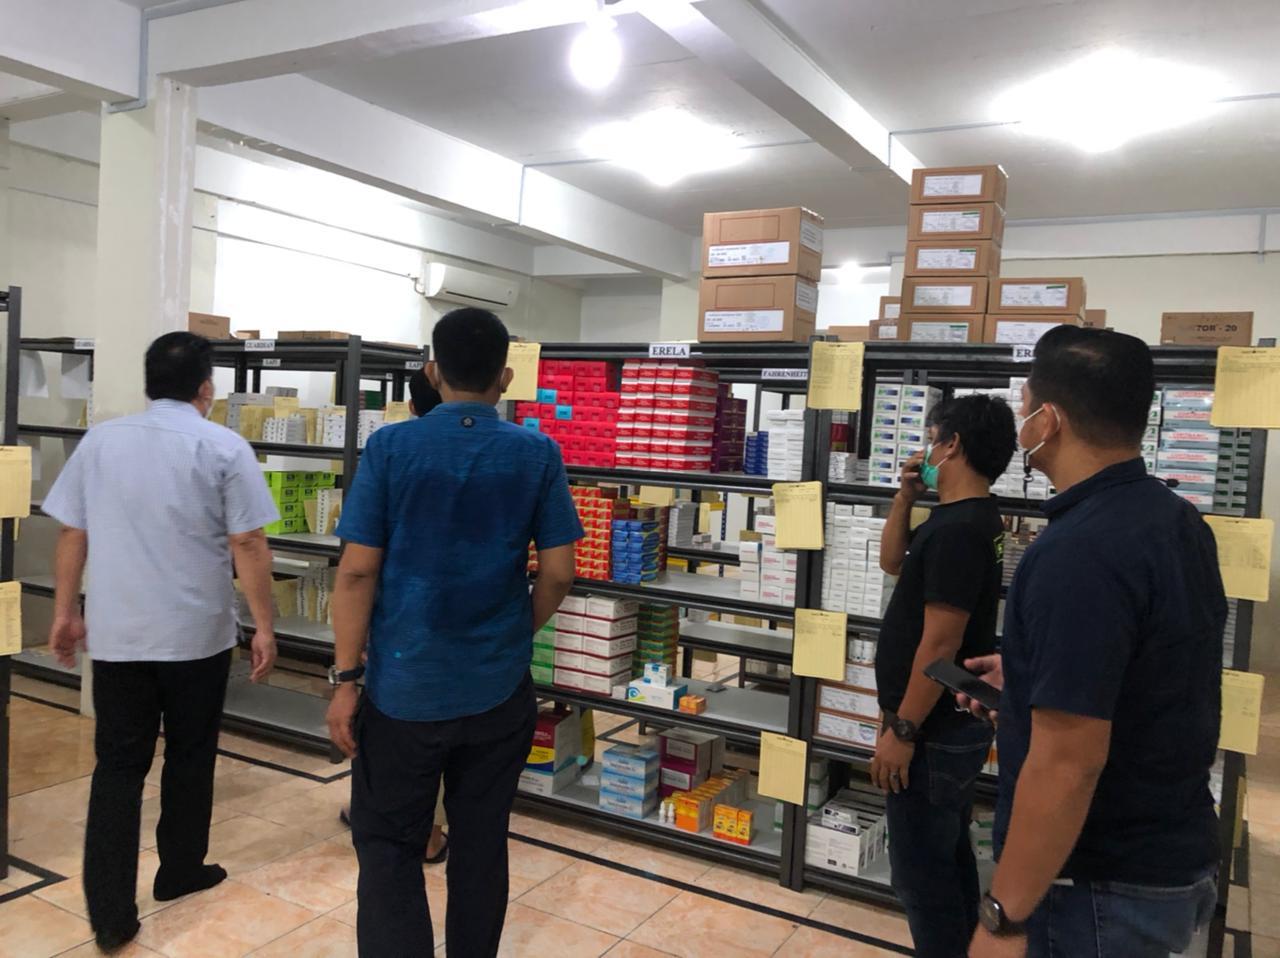 Foto pedagang besar farmasi, permintaan melonjak, satgas pangan, Satgas Pangan Polda Kepri, stok obat dan vitamin, Stok obat-obatan